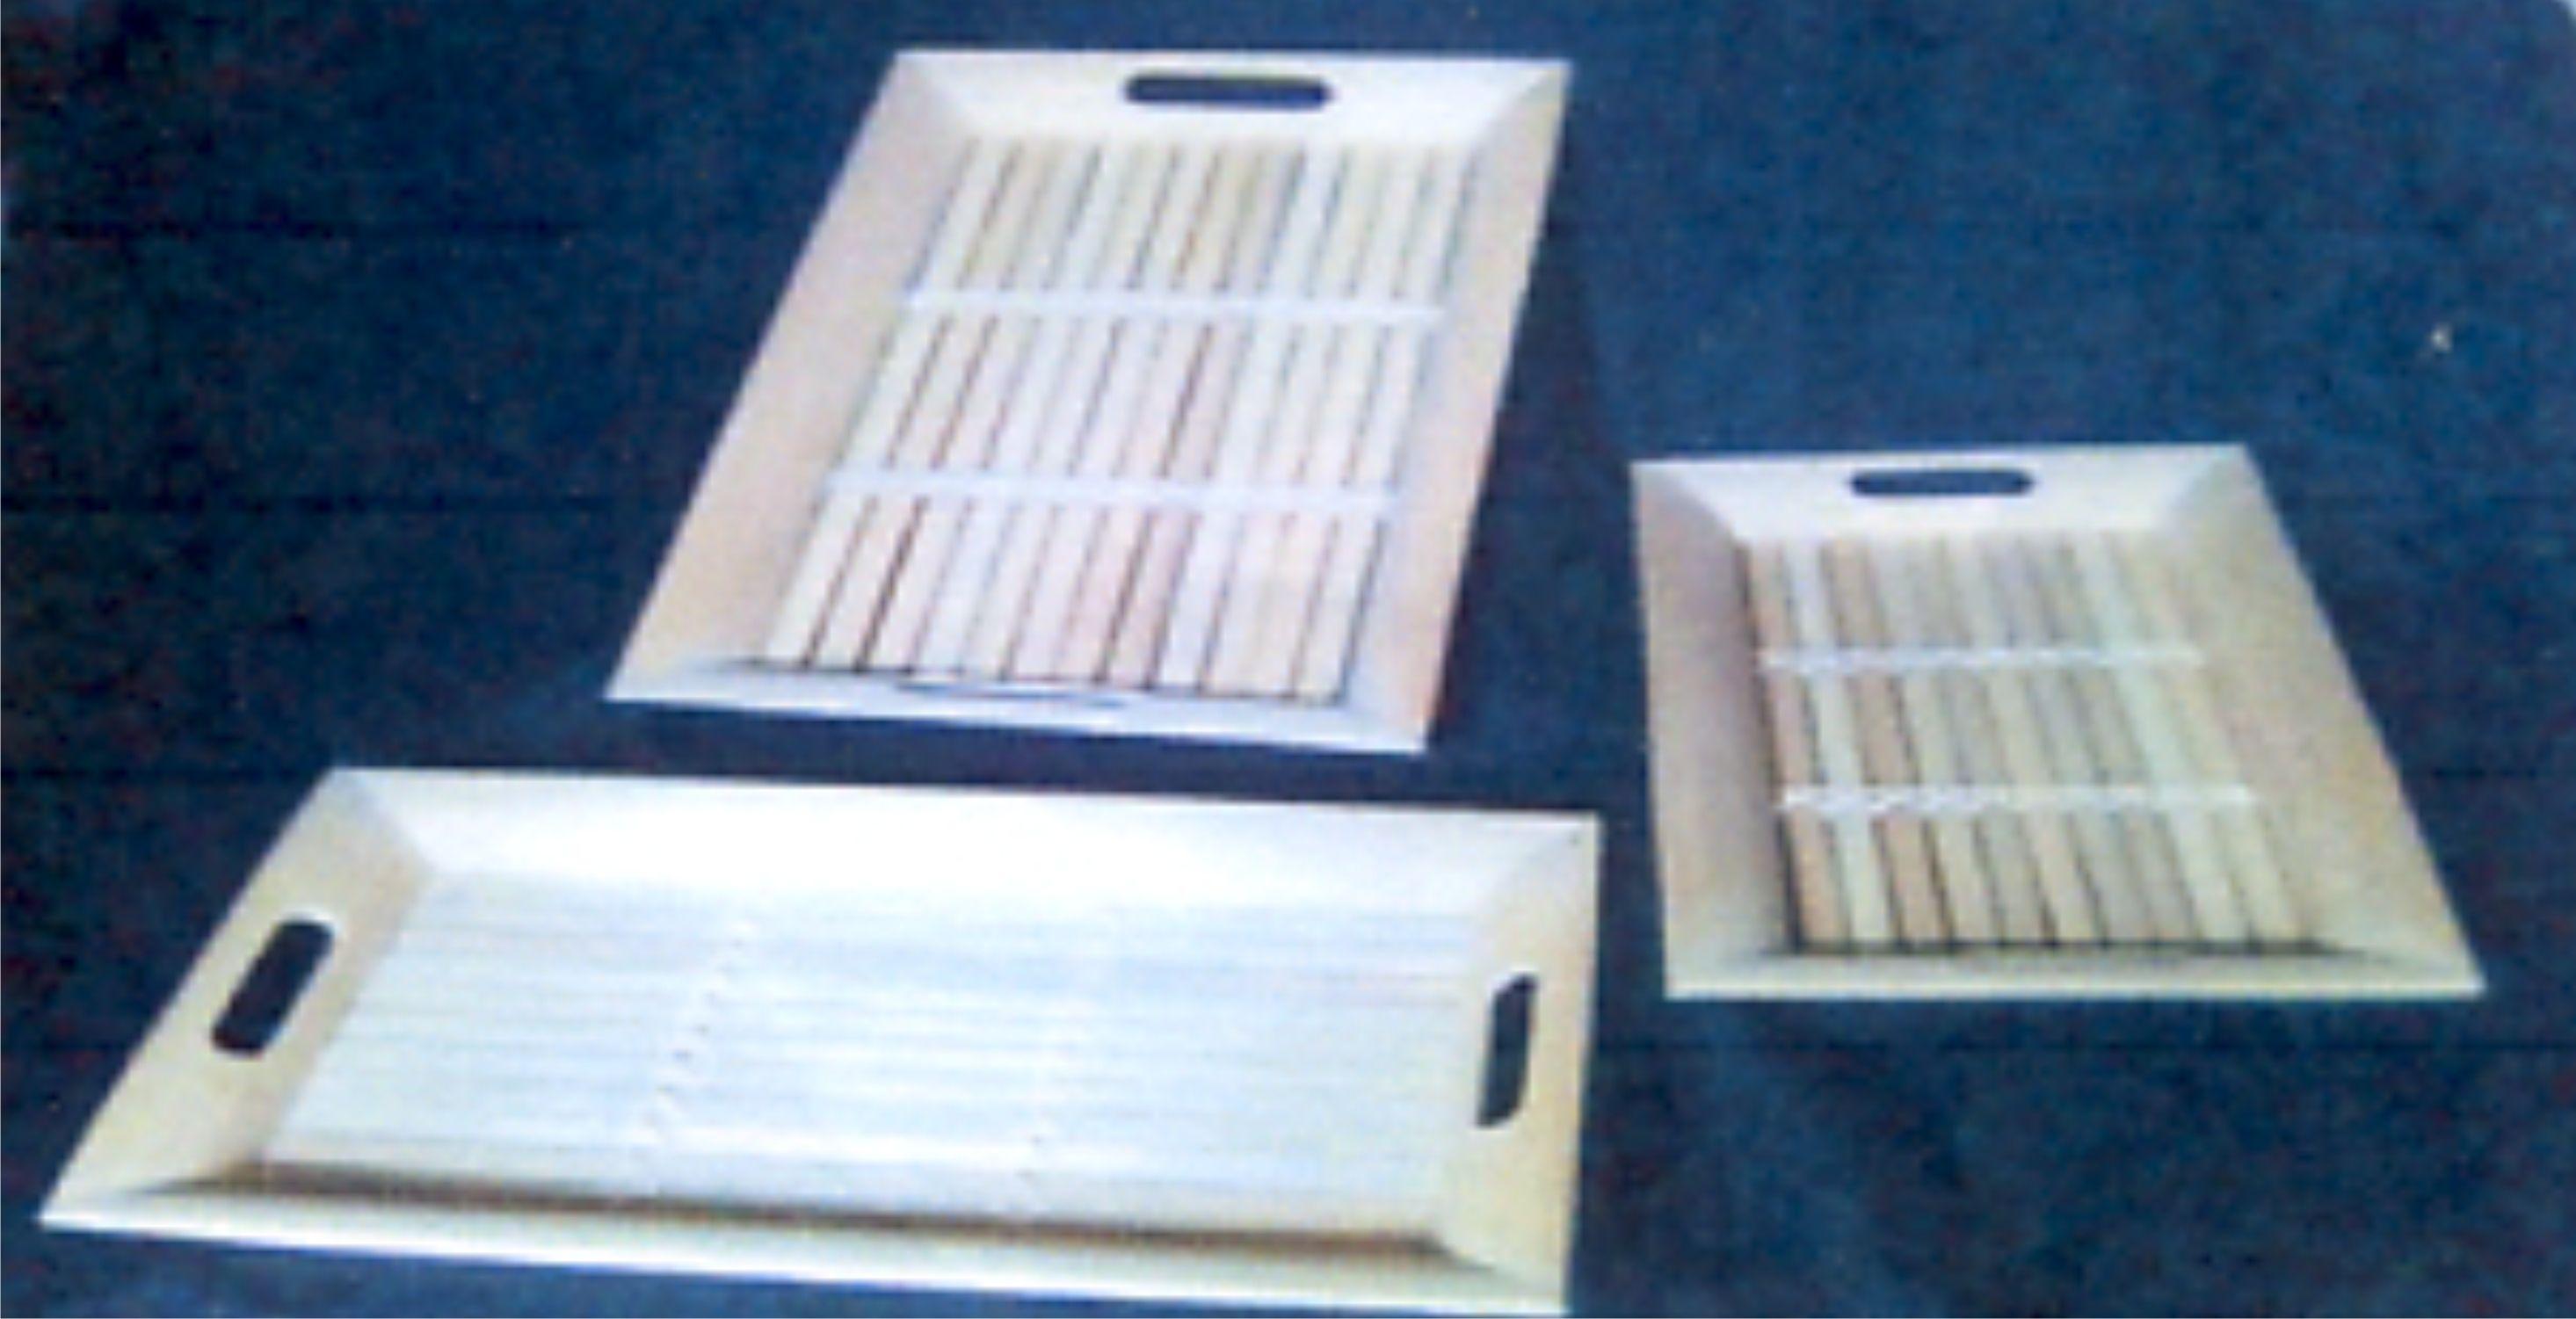 Detikcom Informasi Berita Terupdate Hari Ini Bambu Kerajinan